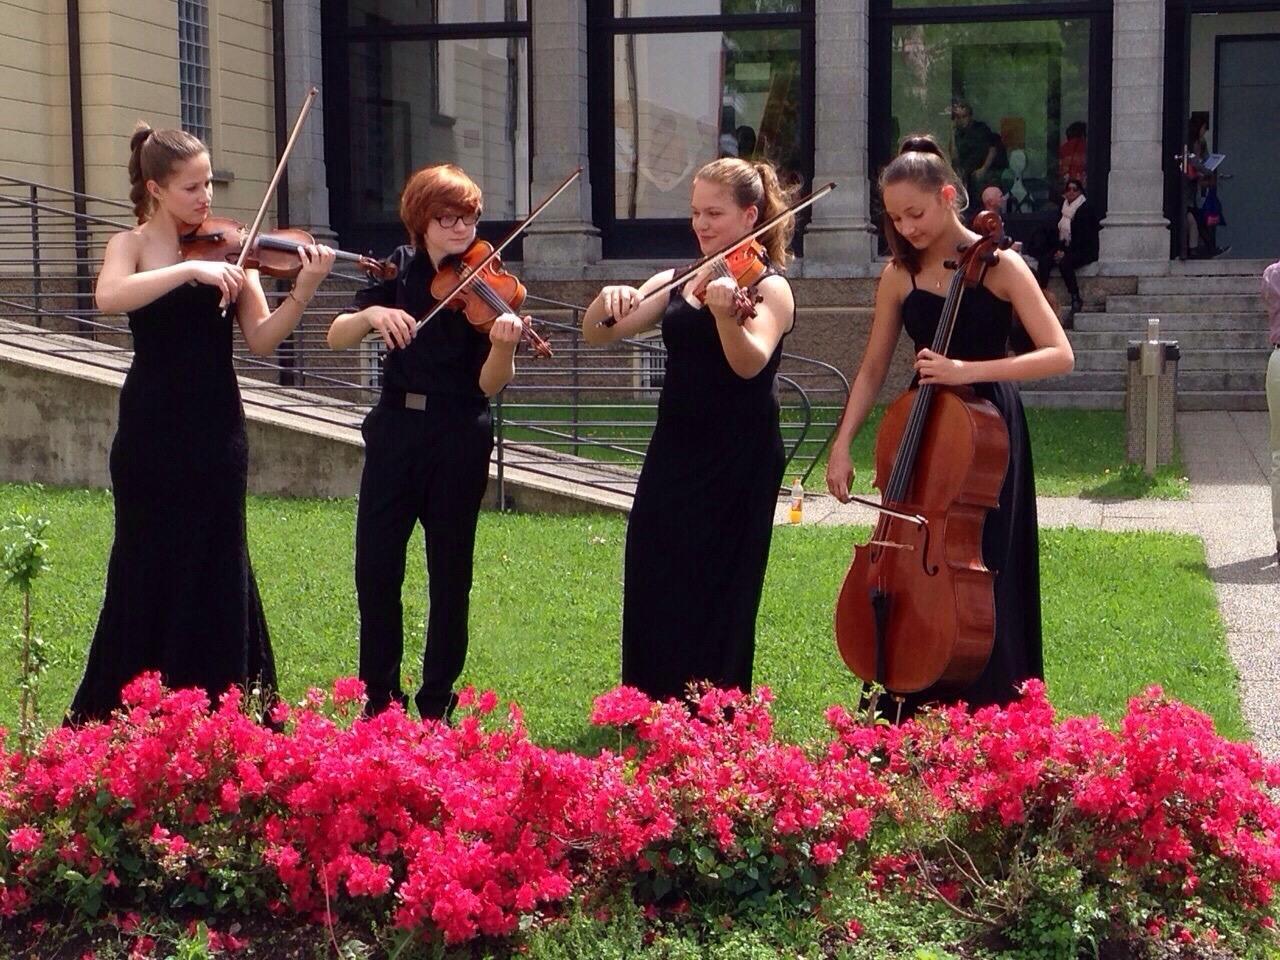 DAAS Quartett - Ariana Puhar, Silvan Dezini, Daphné Faist, Alina Morger